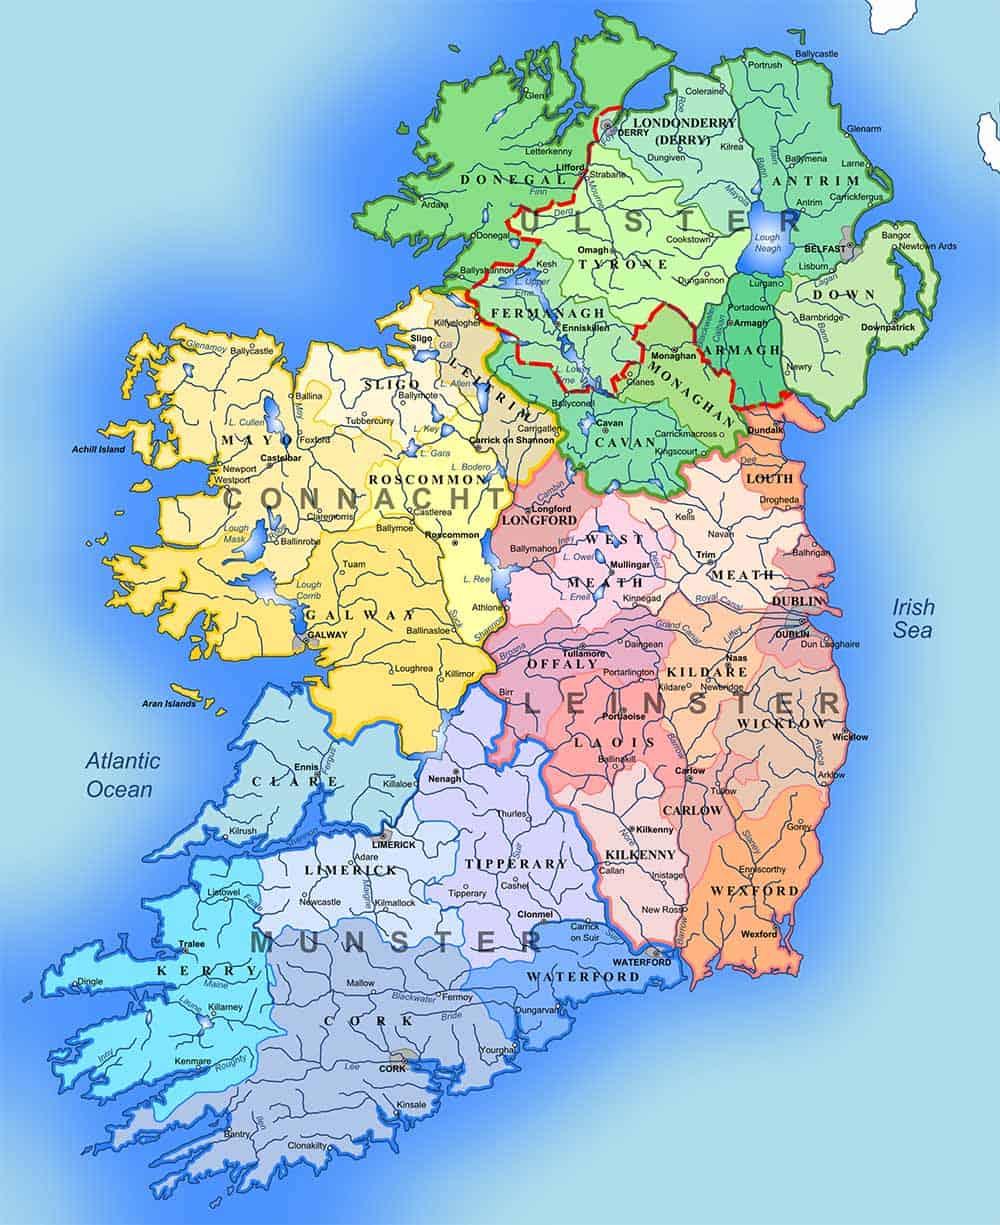 Irlands Countys